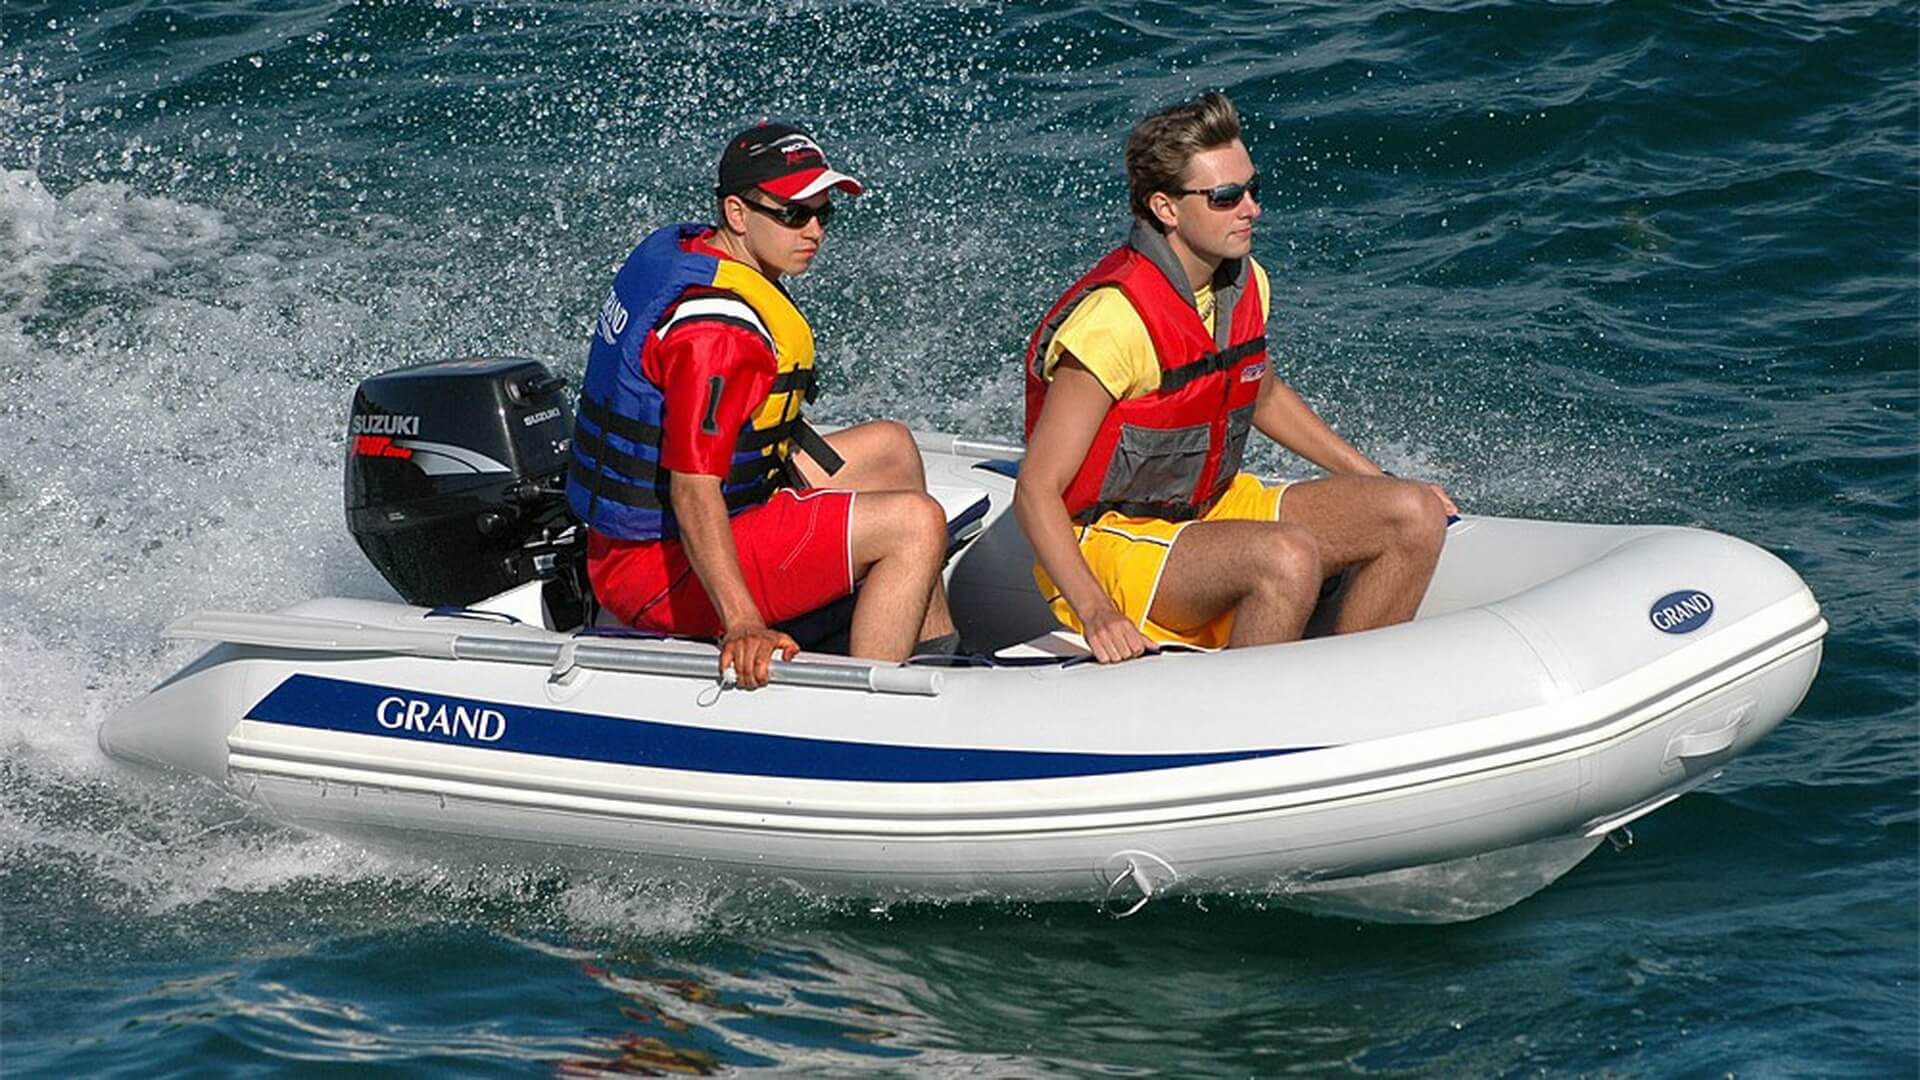 Надувная лодка с жестким дном GRAND Silver Line S275, Надувная лодка GRAND Silver Line S275, GRAND Silver Line S275, GRAND S275, GRAND Silver Line S275F, GRAND S275F, Надувная лодка GRAND, Надувная лодка ГРАНД, Надувная лодка с жестким дном, RIB, Rigid Inflatable Boats